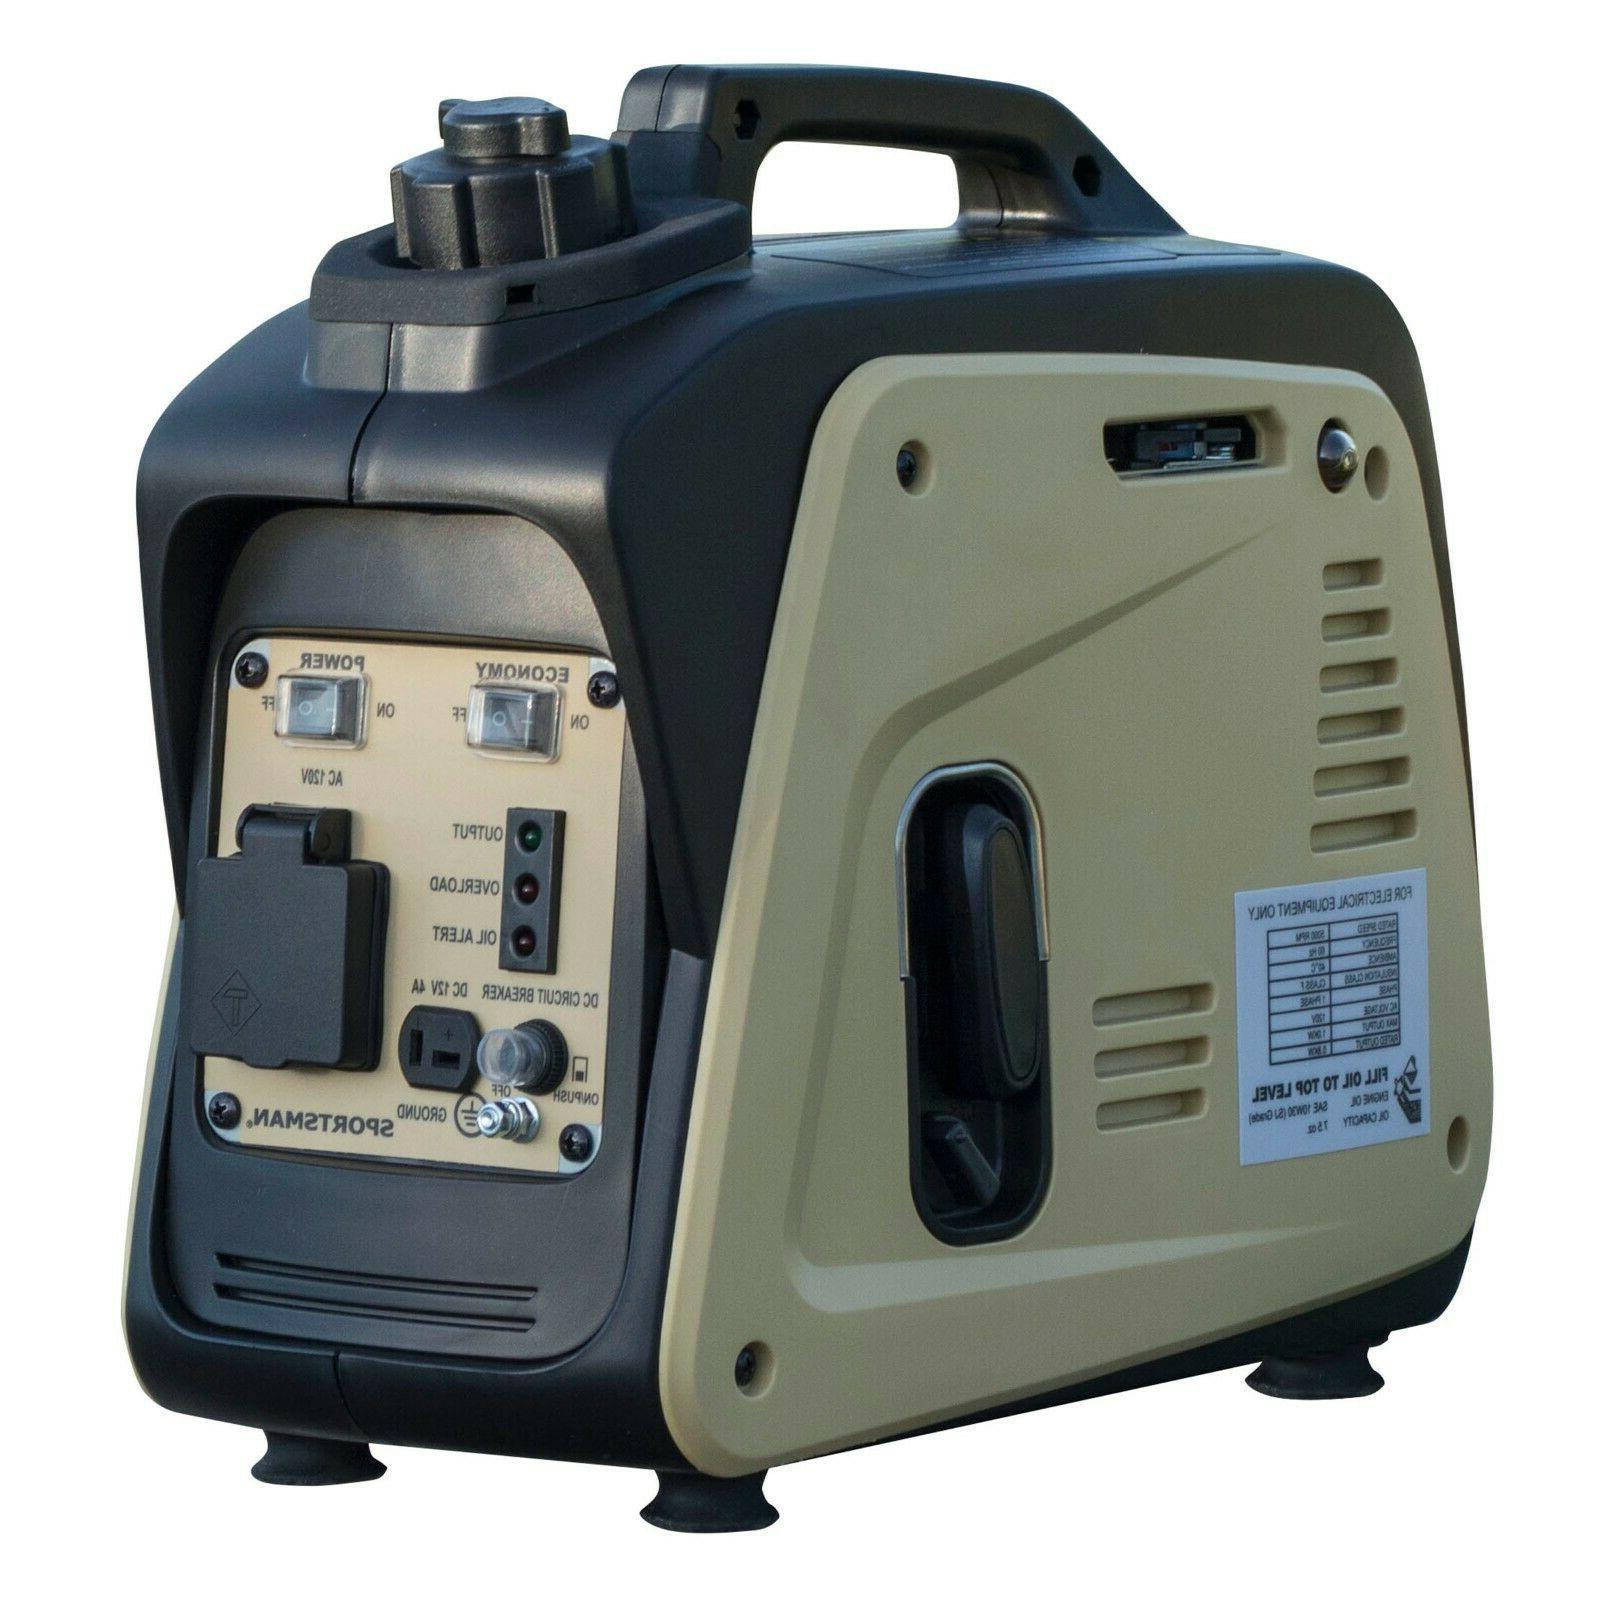 Sportsman 1000 Watt Inverter Generator Portable Gas Energy Q